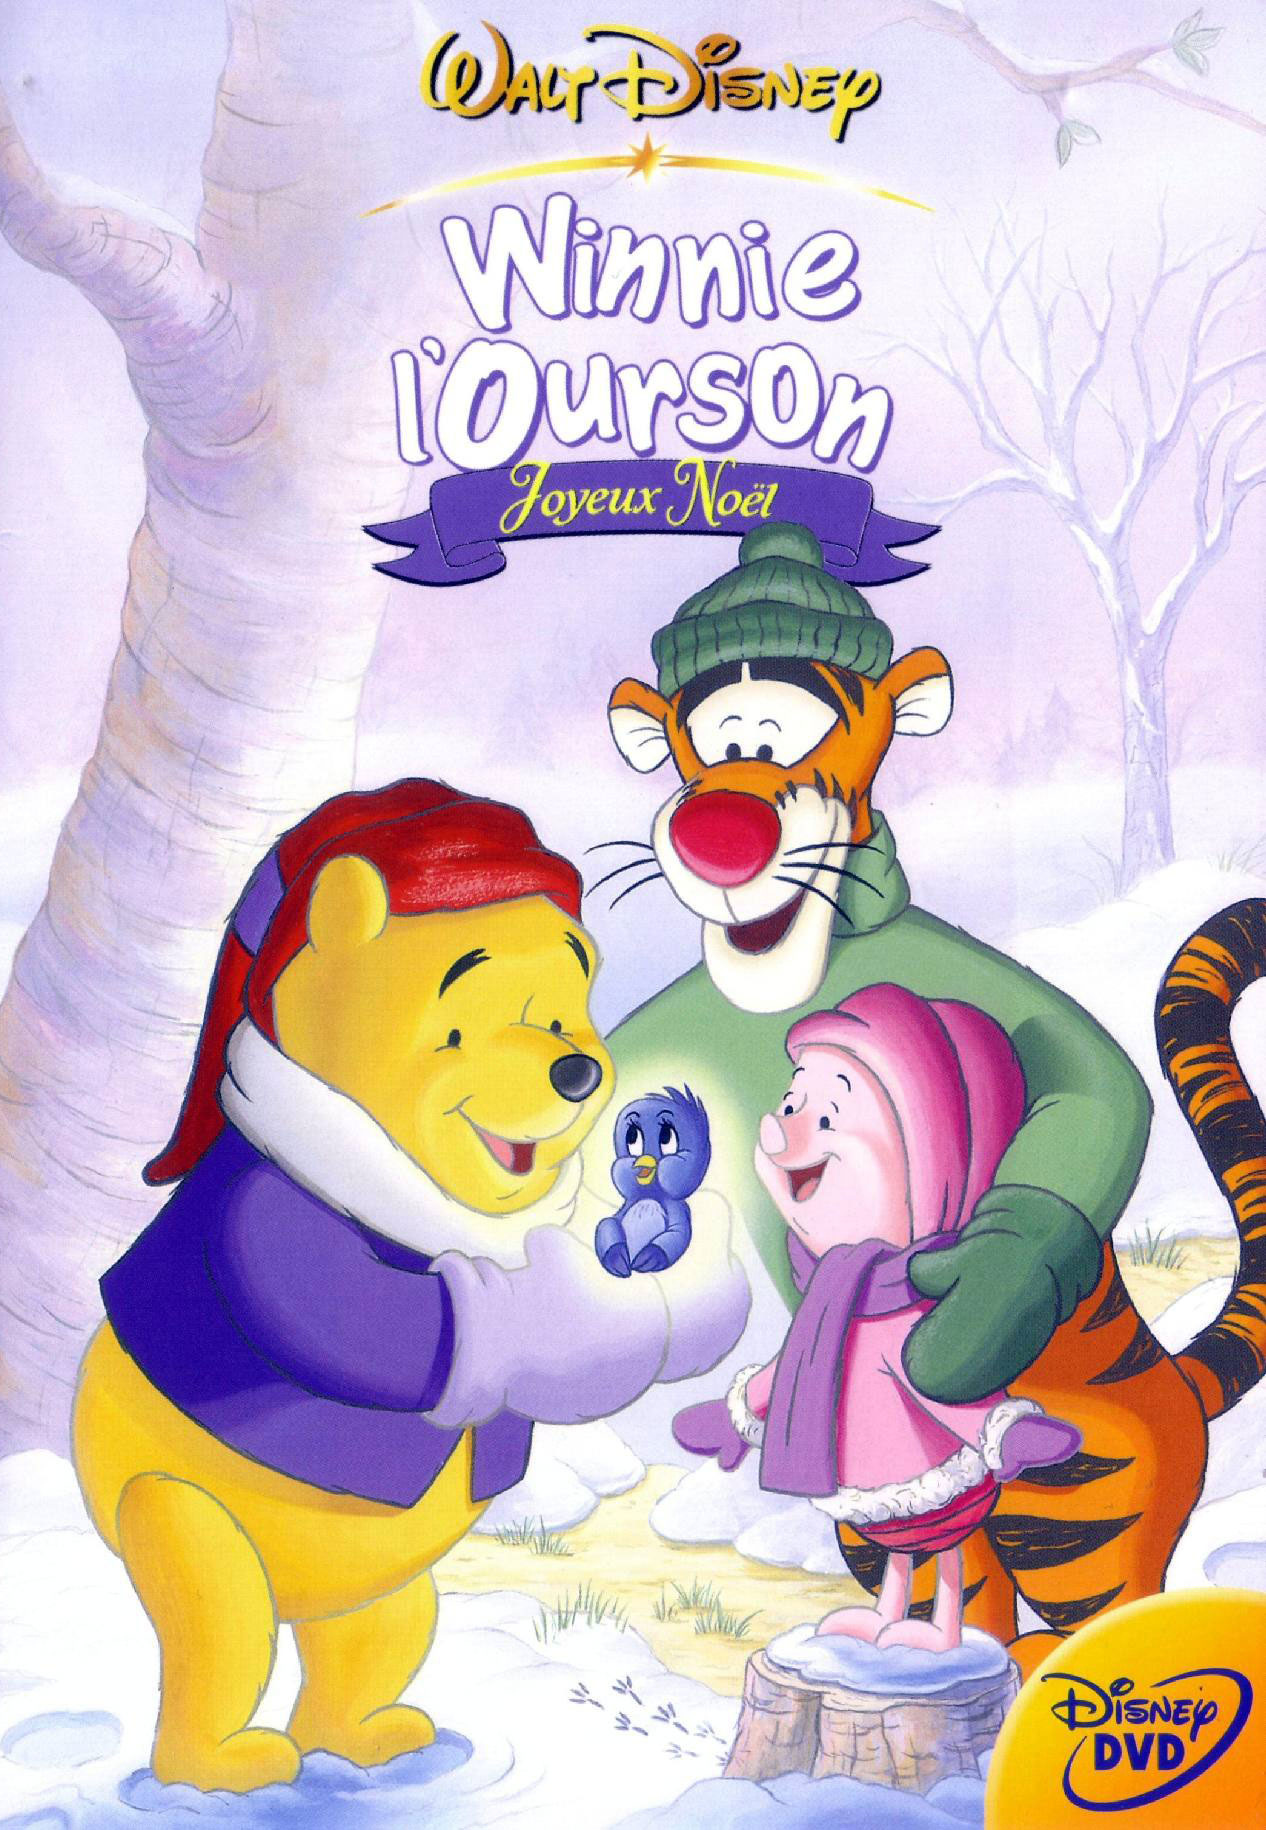 affiche poster winnie ourson joyeux noel seasons spring disney pooh